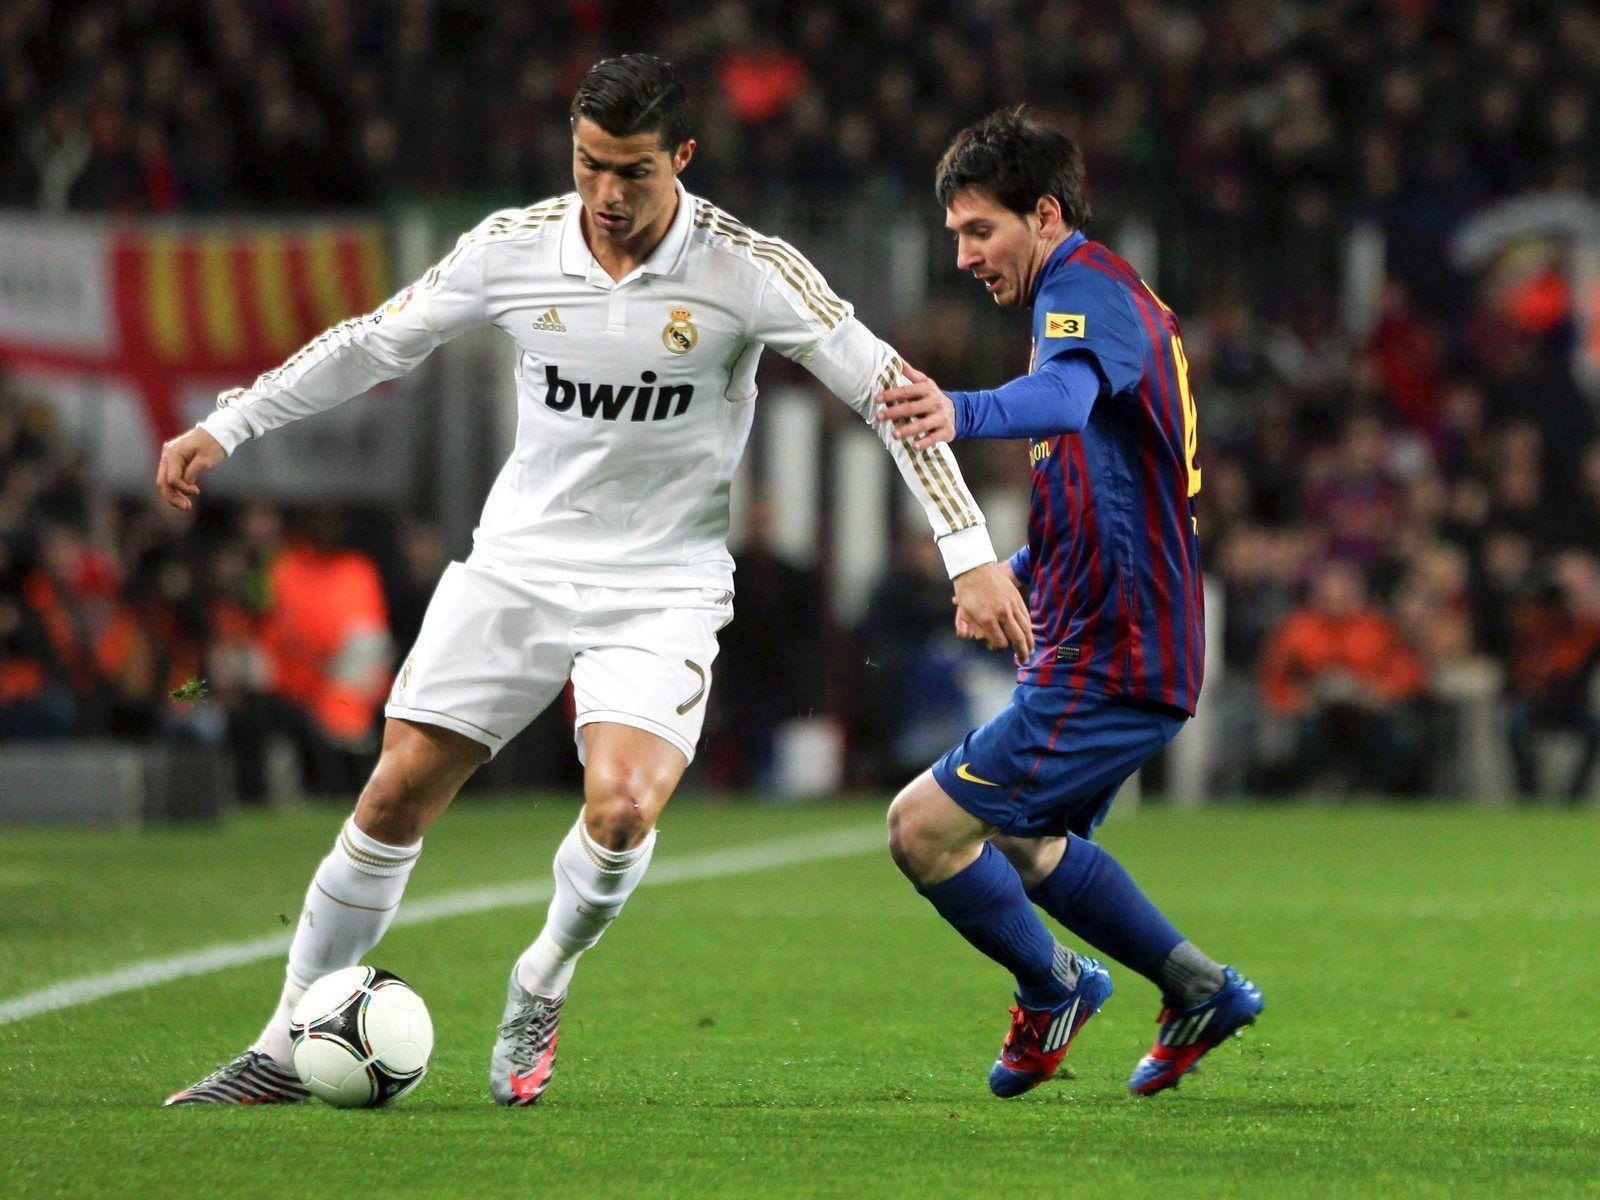 Cristiano Ronaldo Free Kick Hd Wallpapers Cristiano Ronaldo